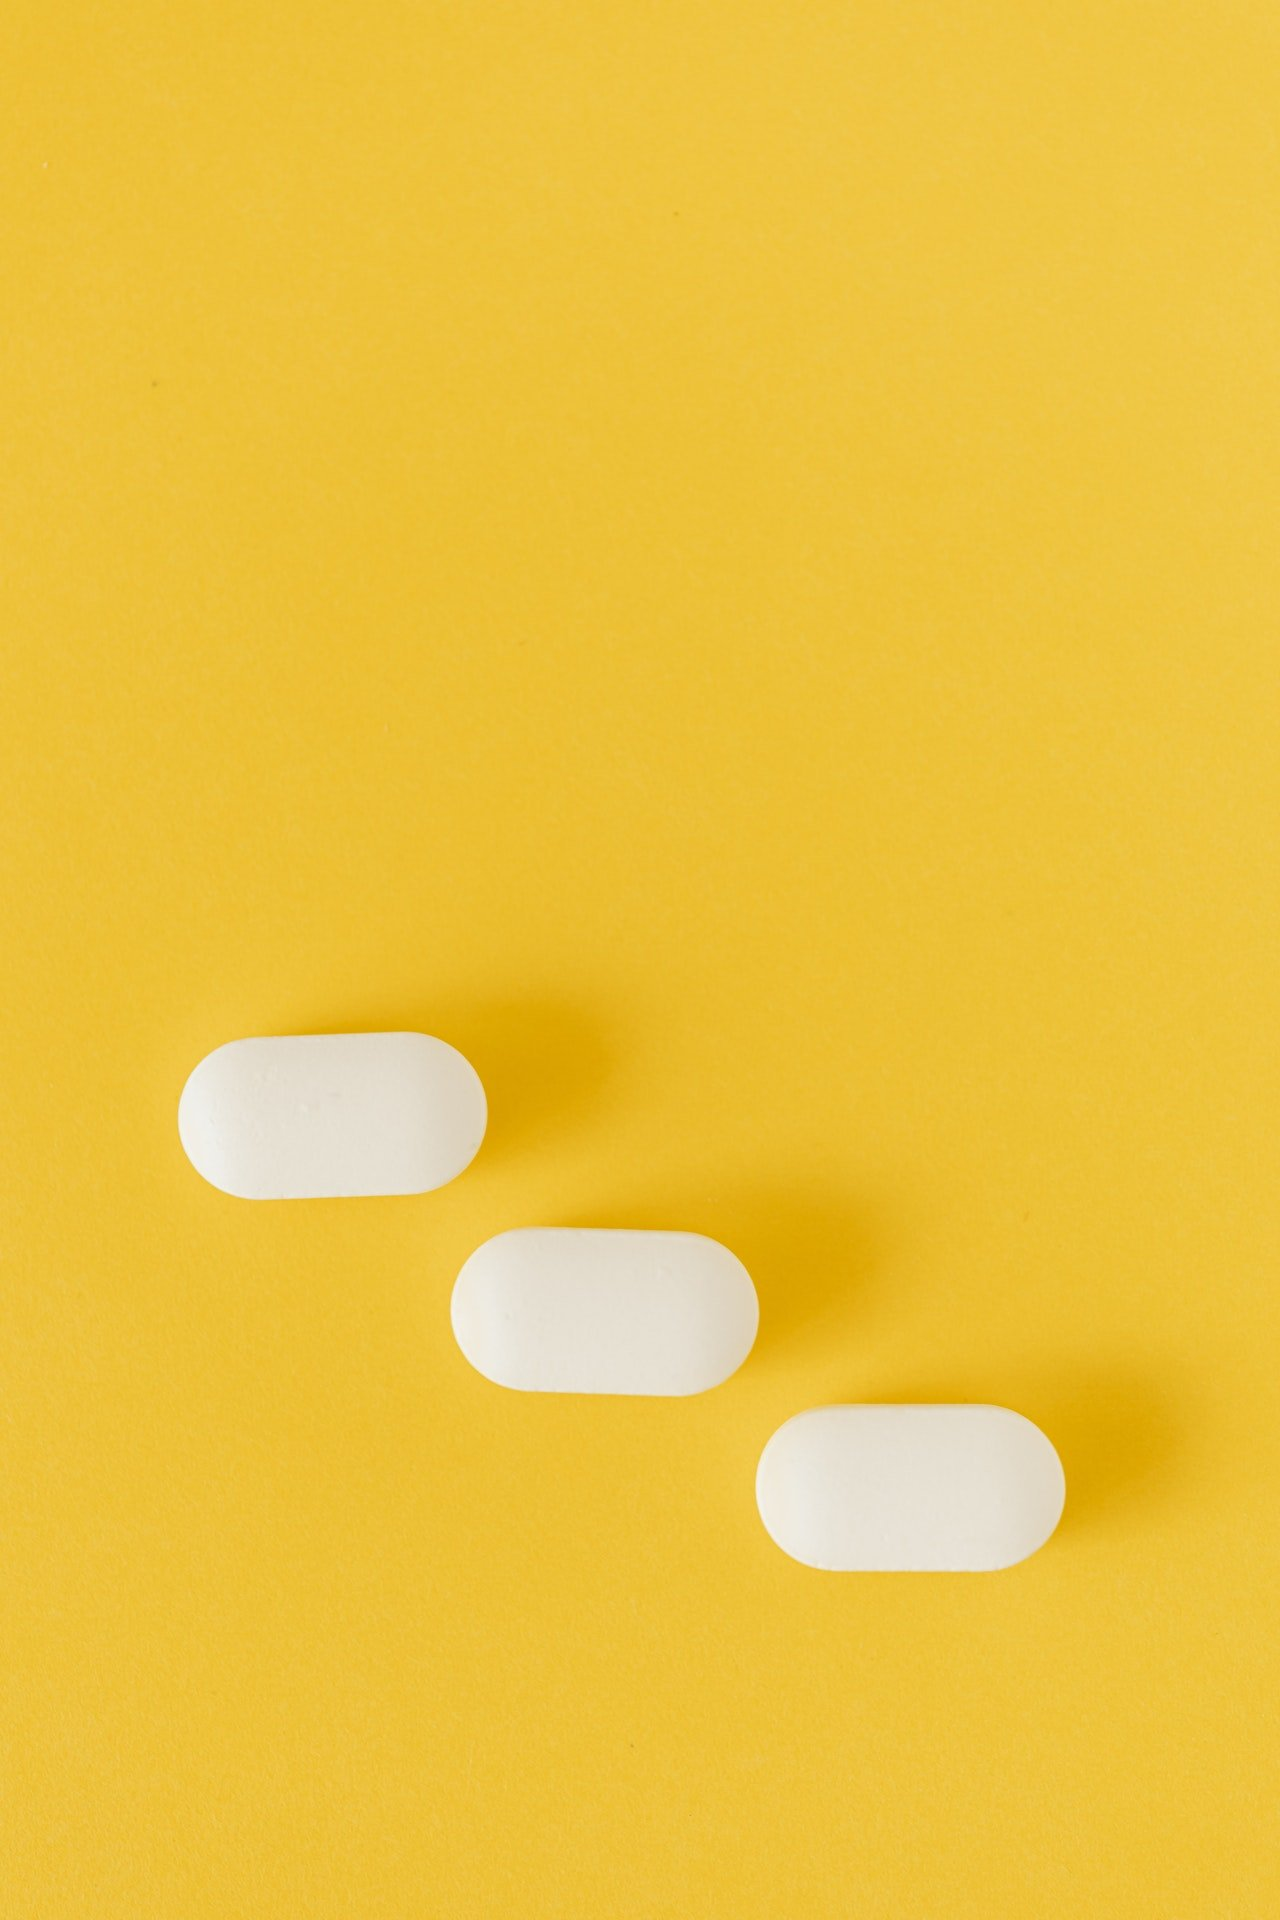 david sinclair supplements